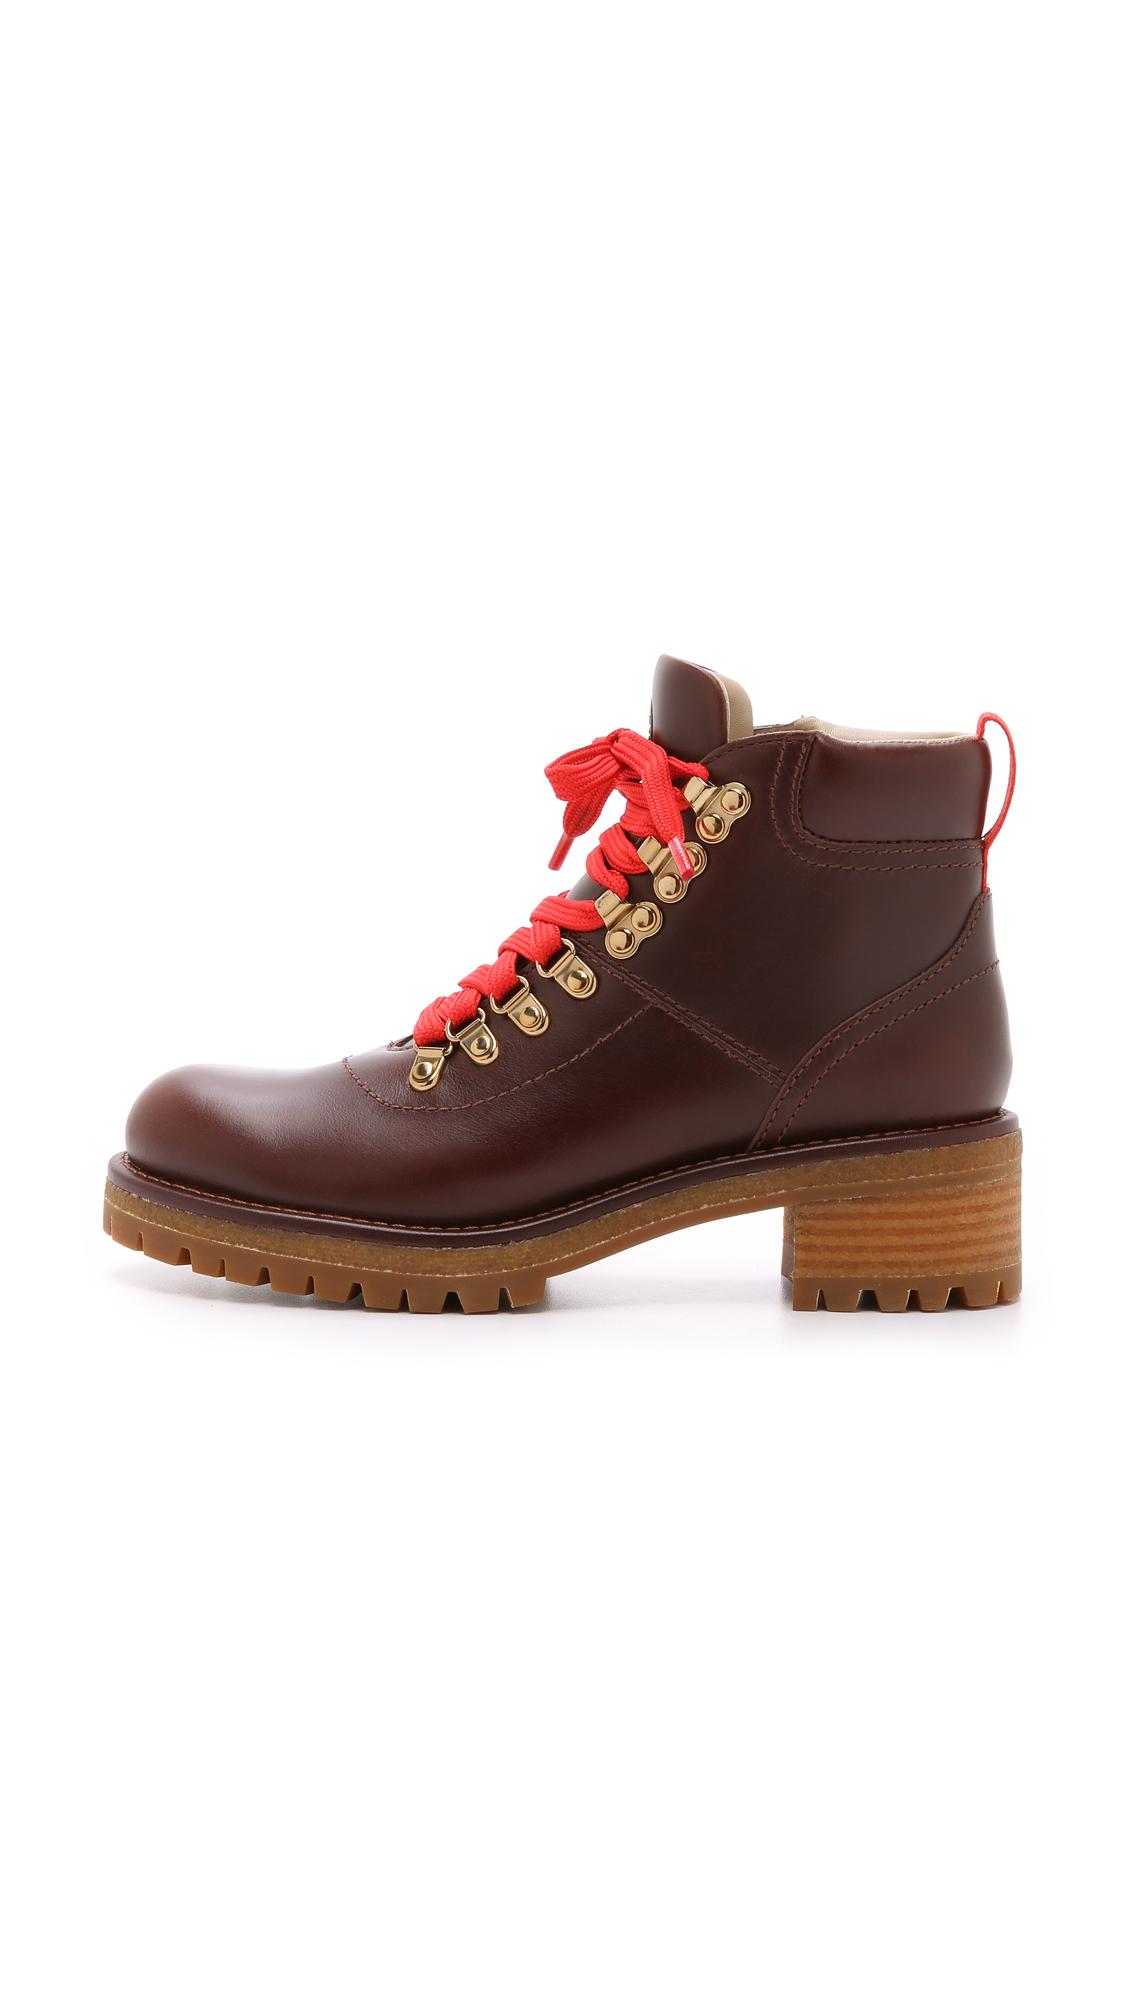 cd977633e5f Lyst - Tory Burch Gunton Hiking Booties in Brown